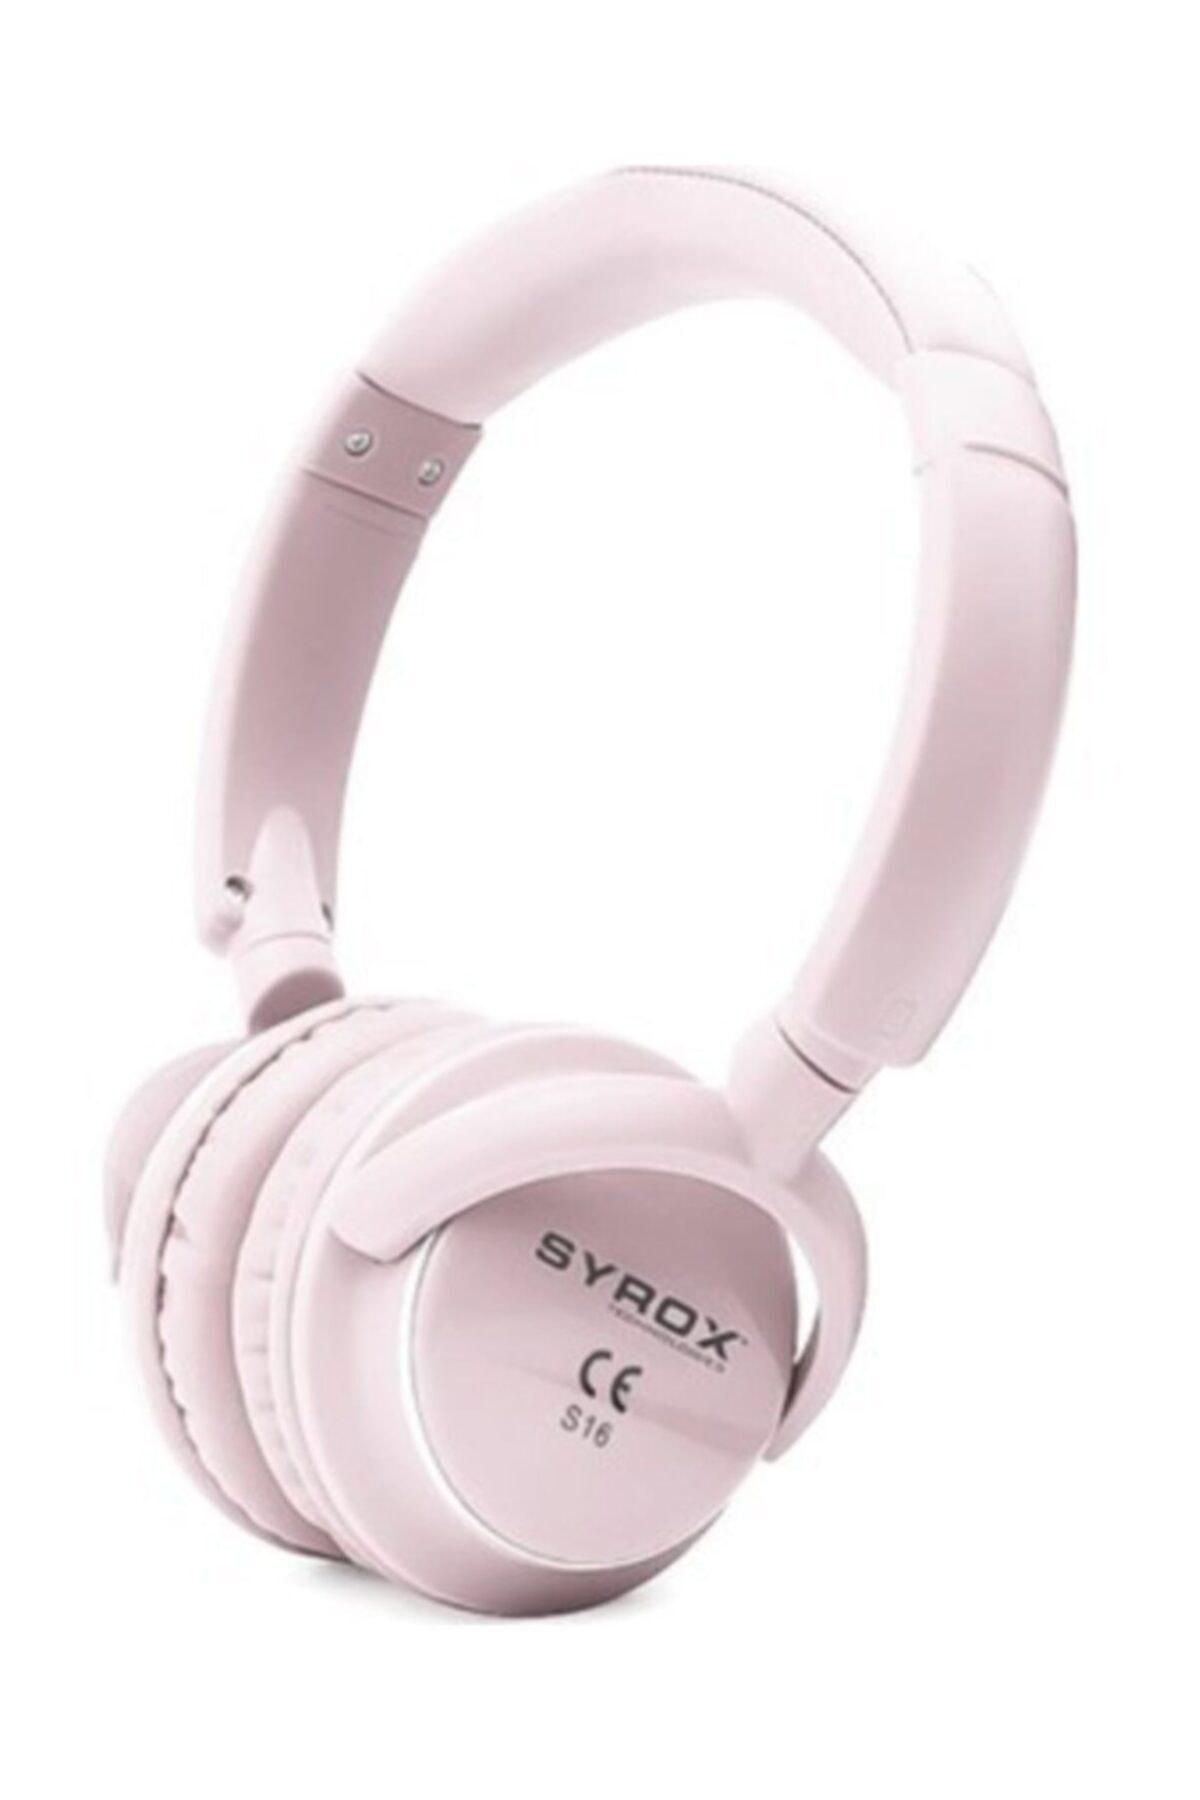 S16 Kablosuz Hafıza Kartlı Bluetooth Kulaklık - Syx-s16